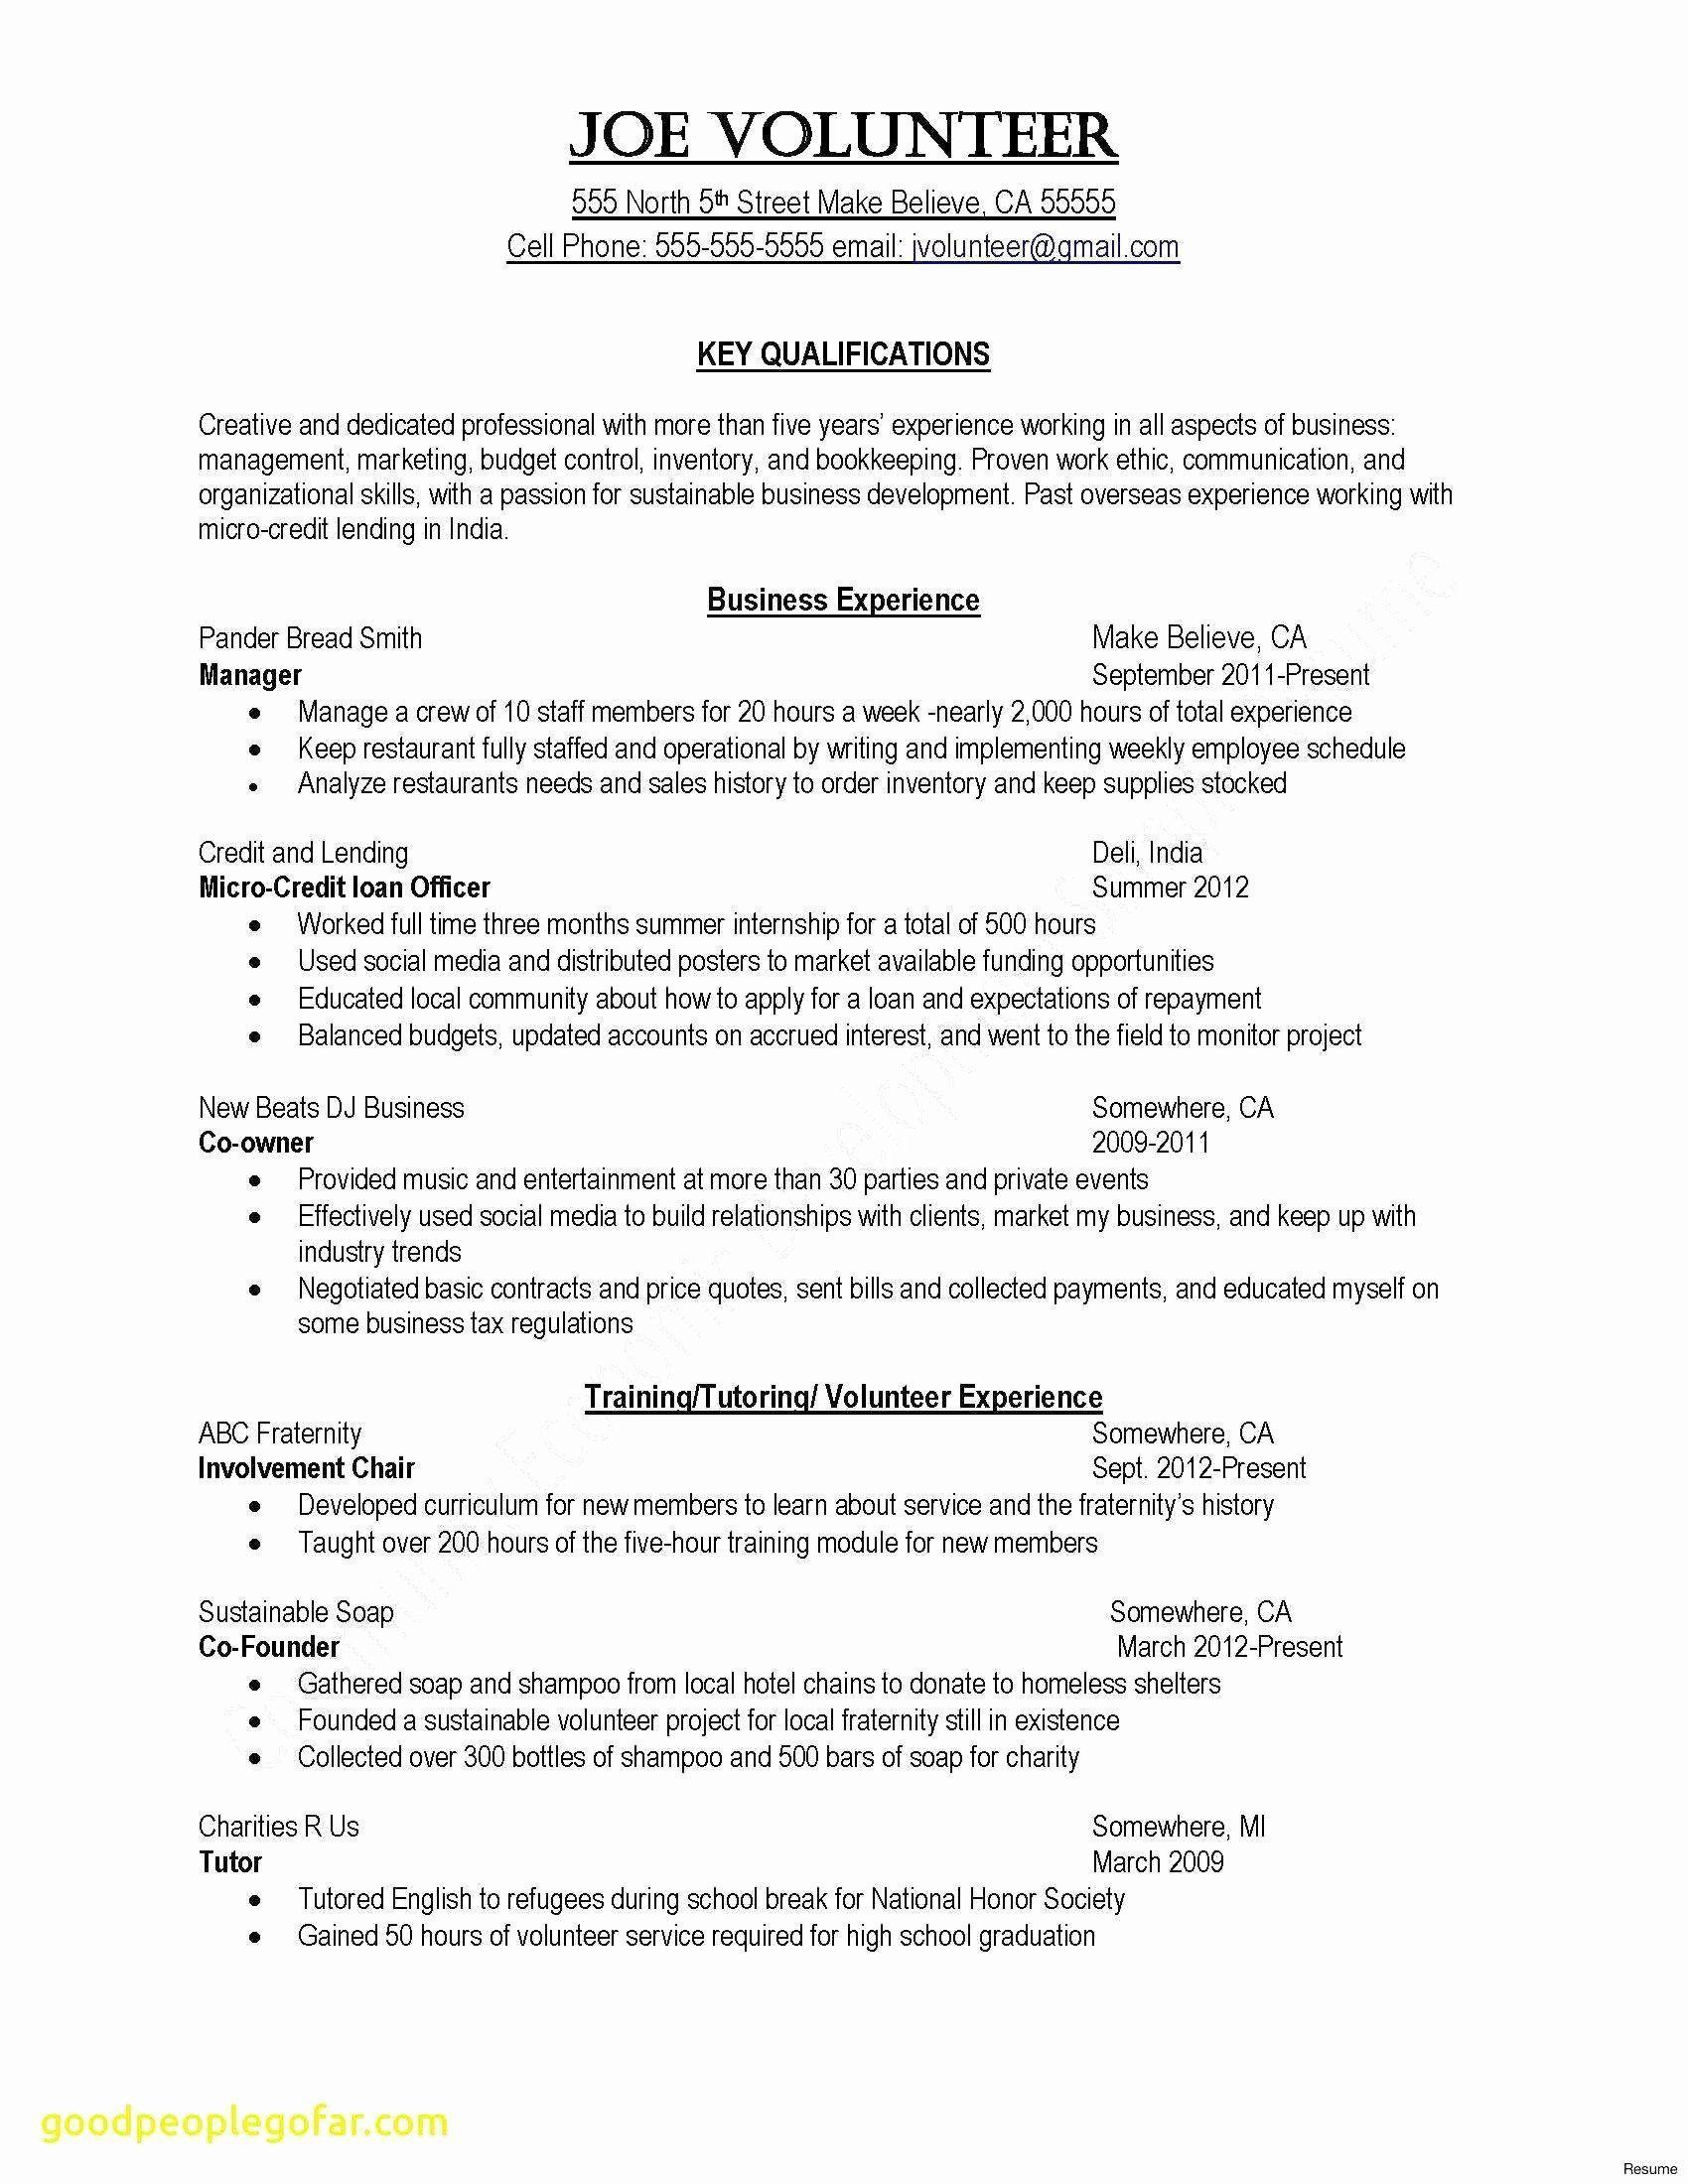 Accounting Clerk Jobs